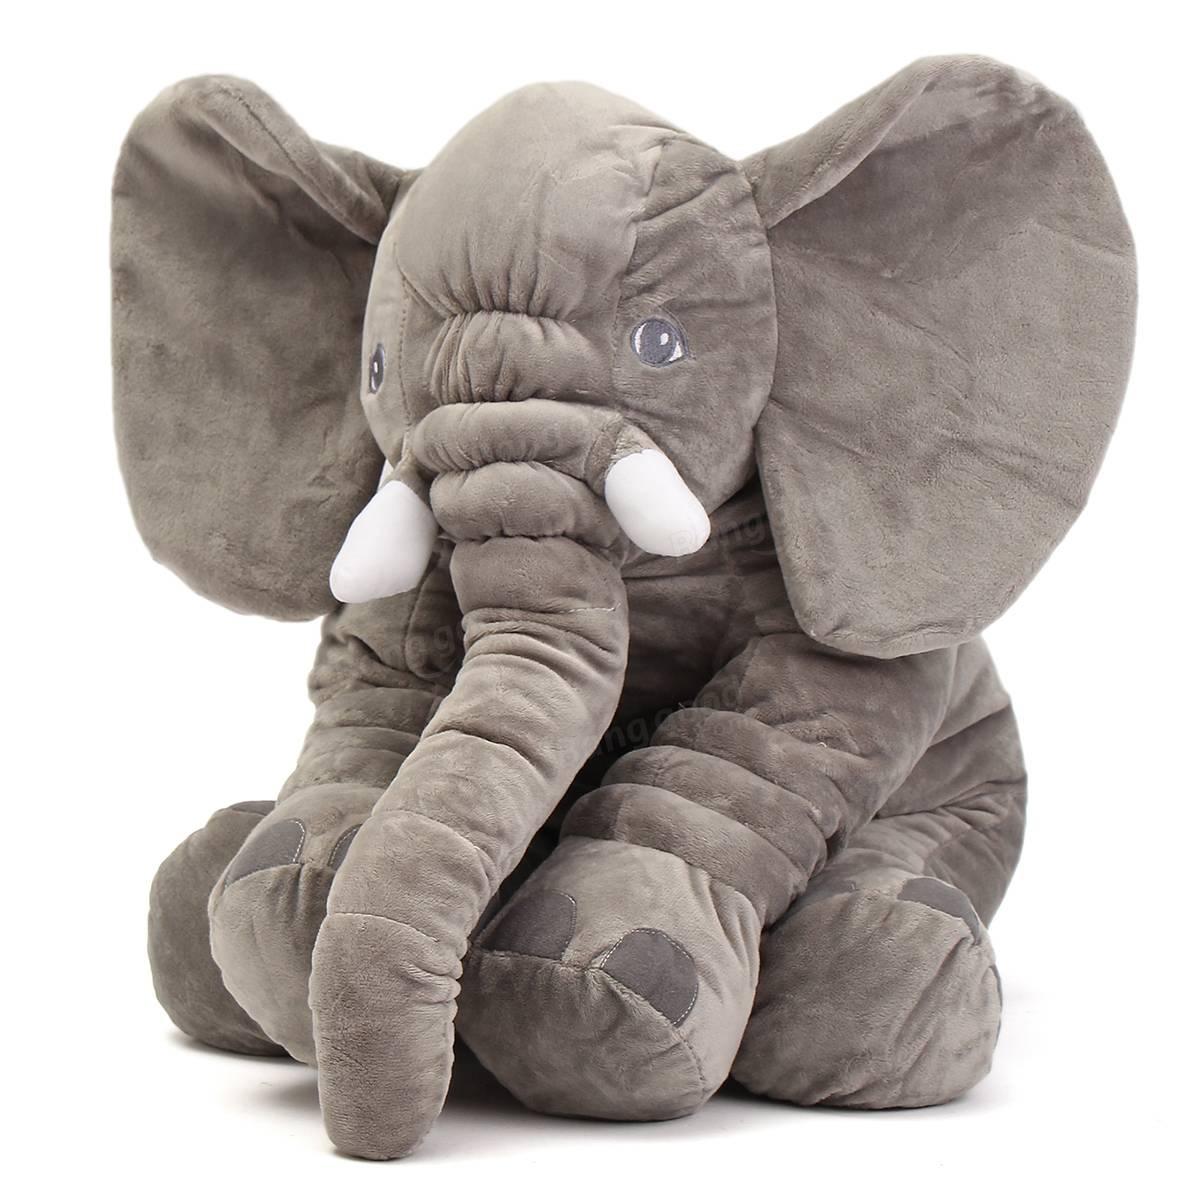 235 60cm Cute Jumbo Elephant Plush Doll Stuffed Animal